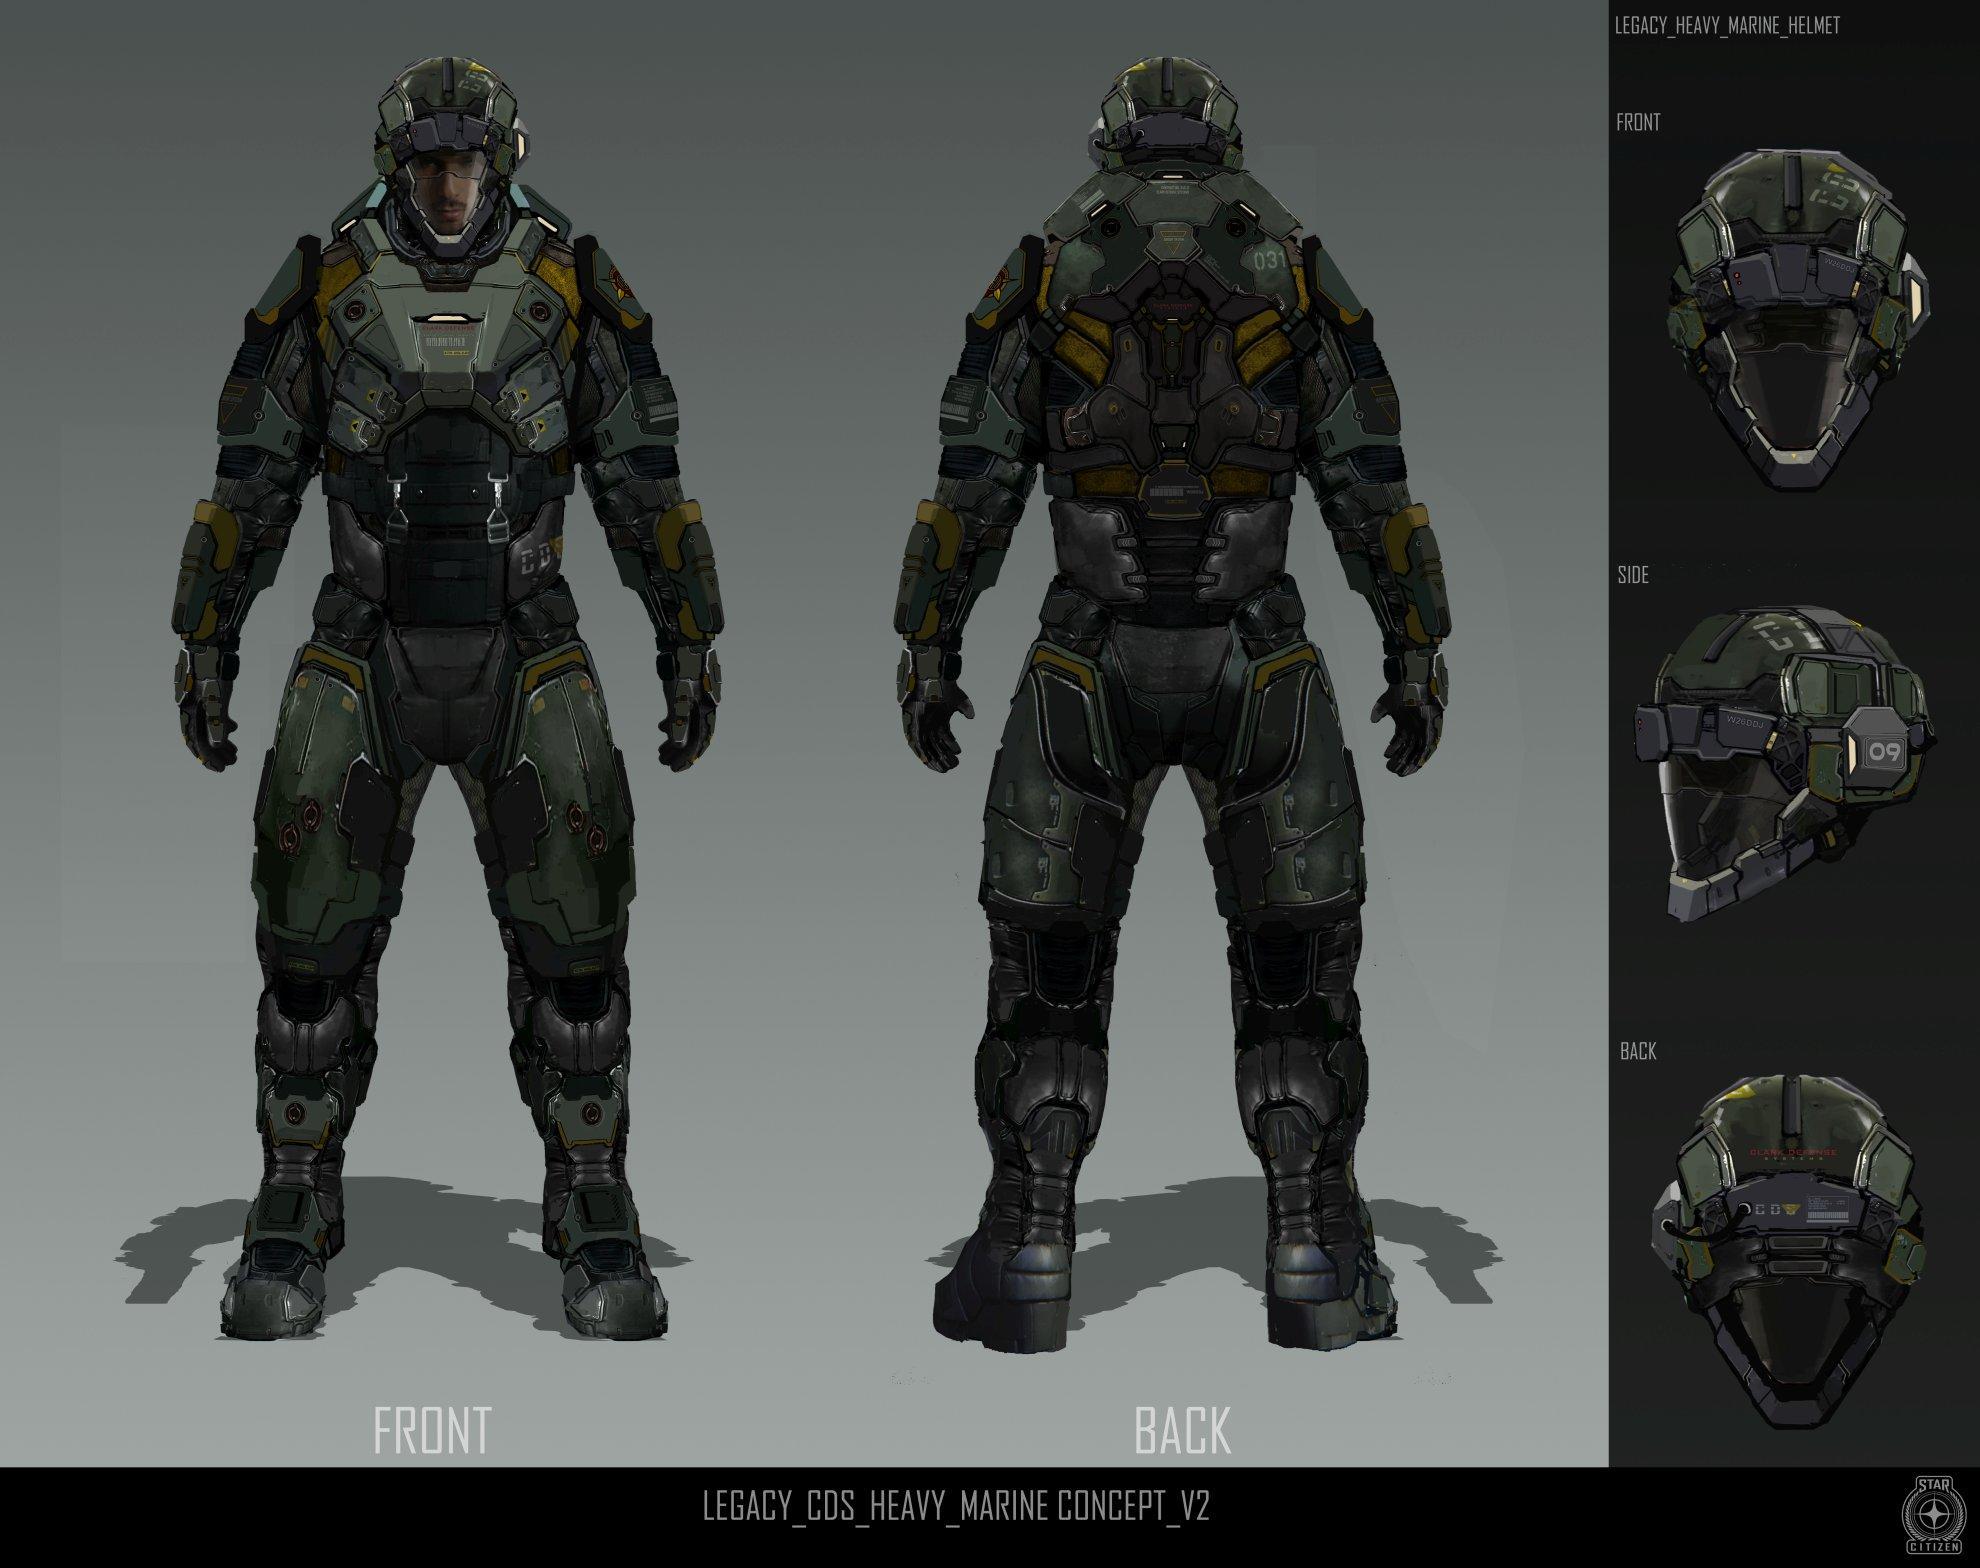 Legacy Heavy Marine Armor Concept